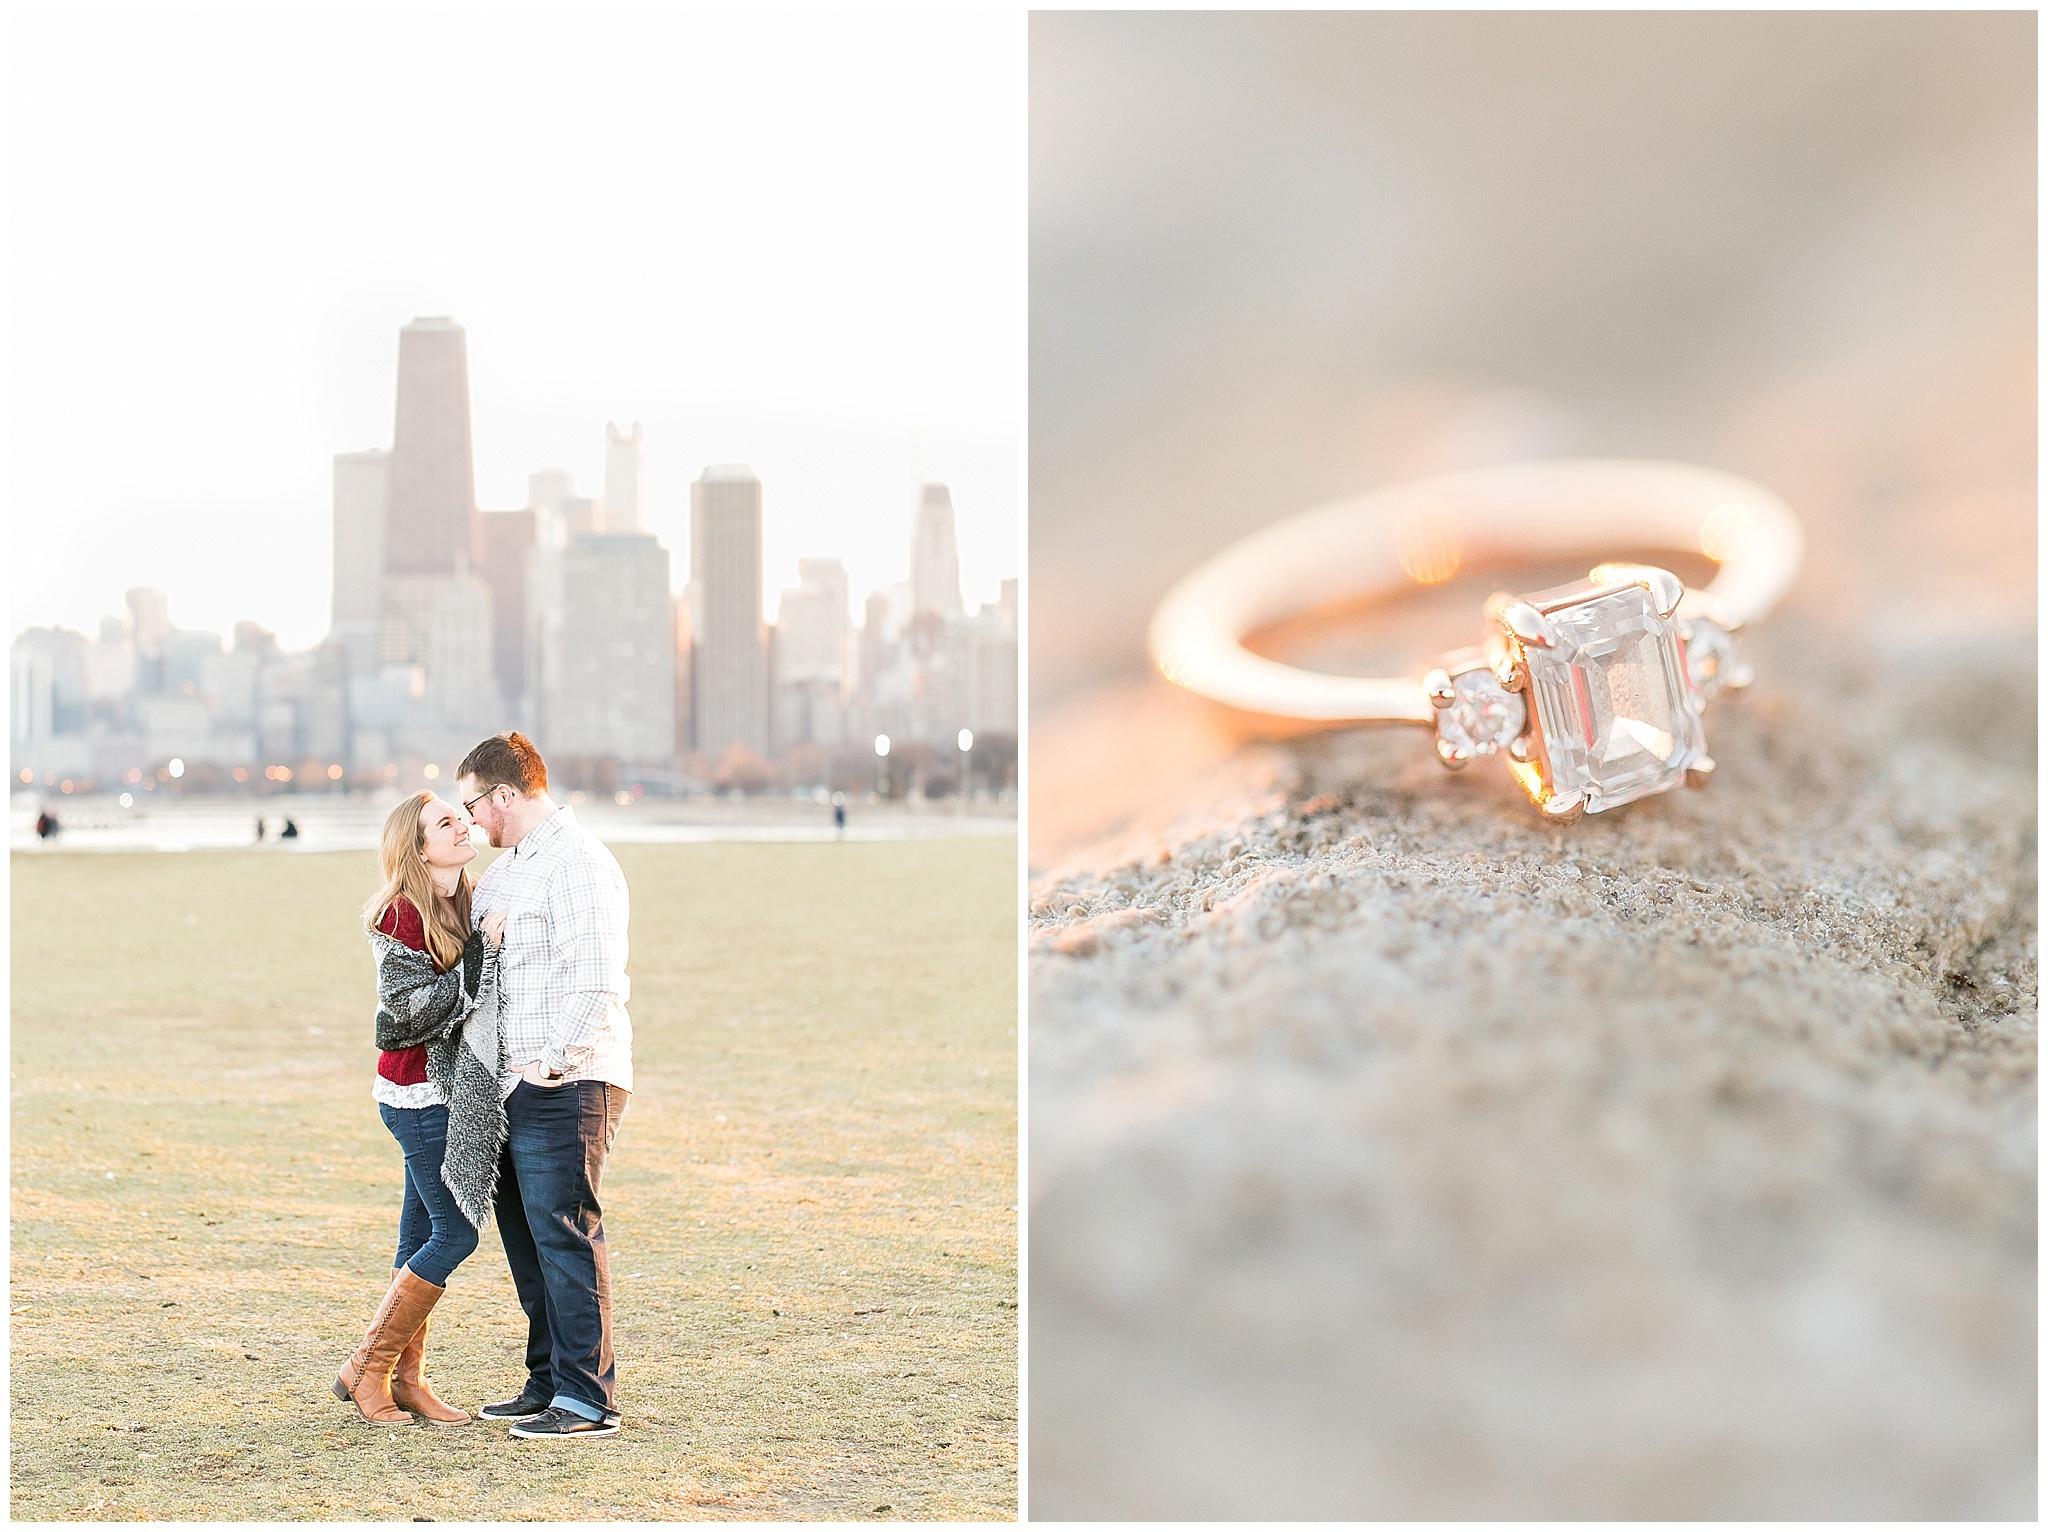 Chicago_Engagement_and_wedding_photographer_chicago_skyline_1001.jpg